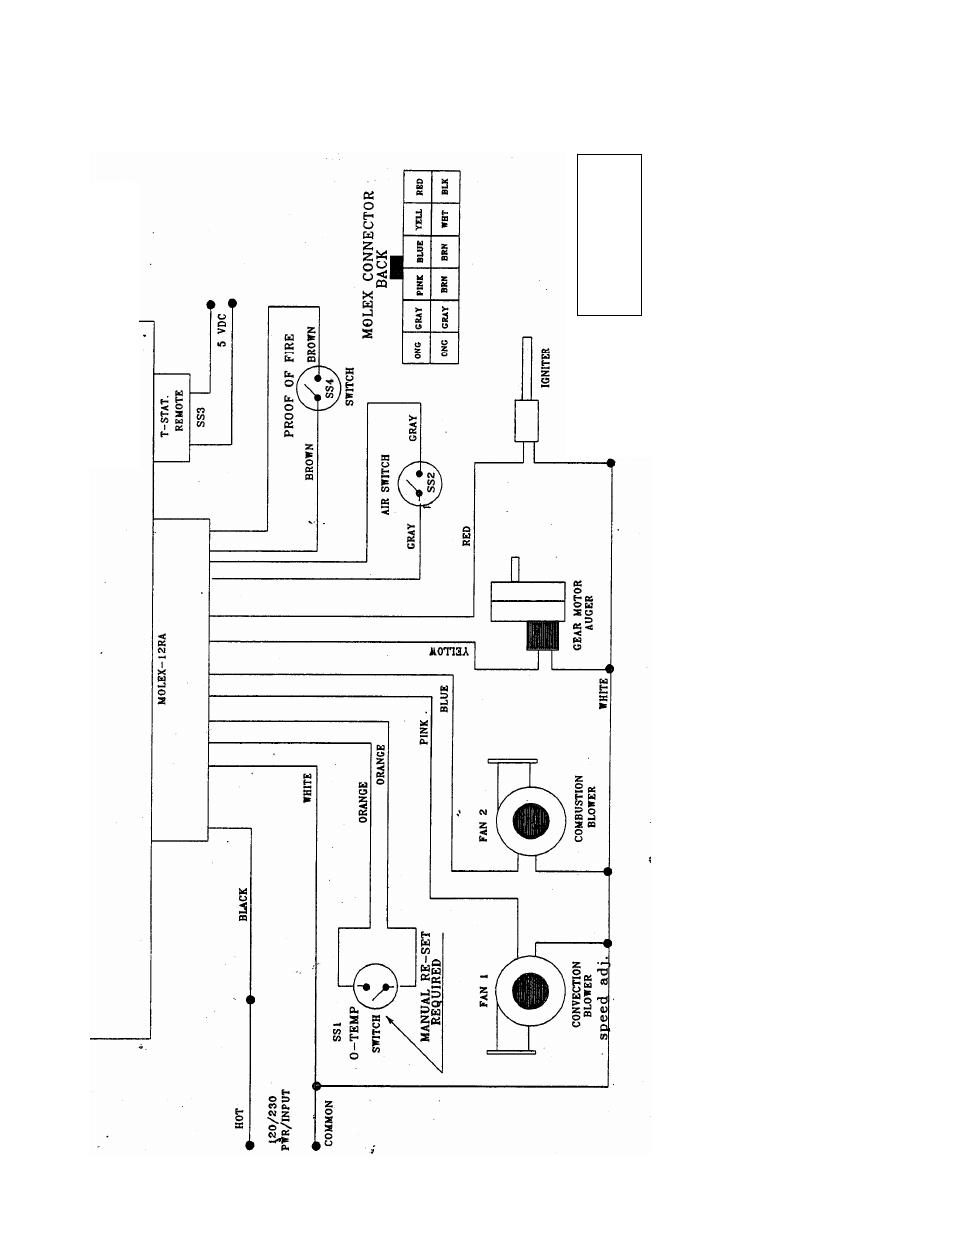 Wiring Diagram PDF: 2003 Expedition Wiring Schematic